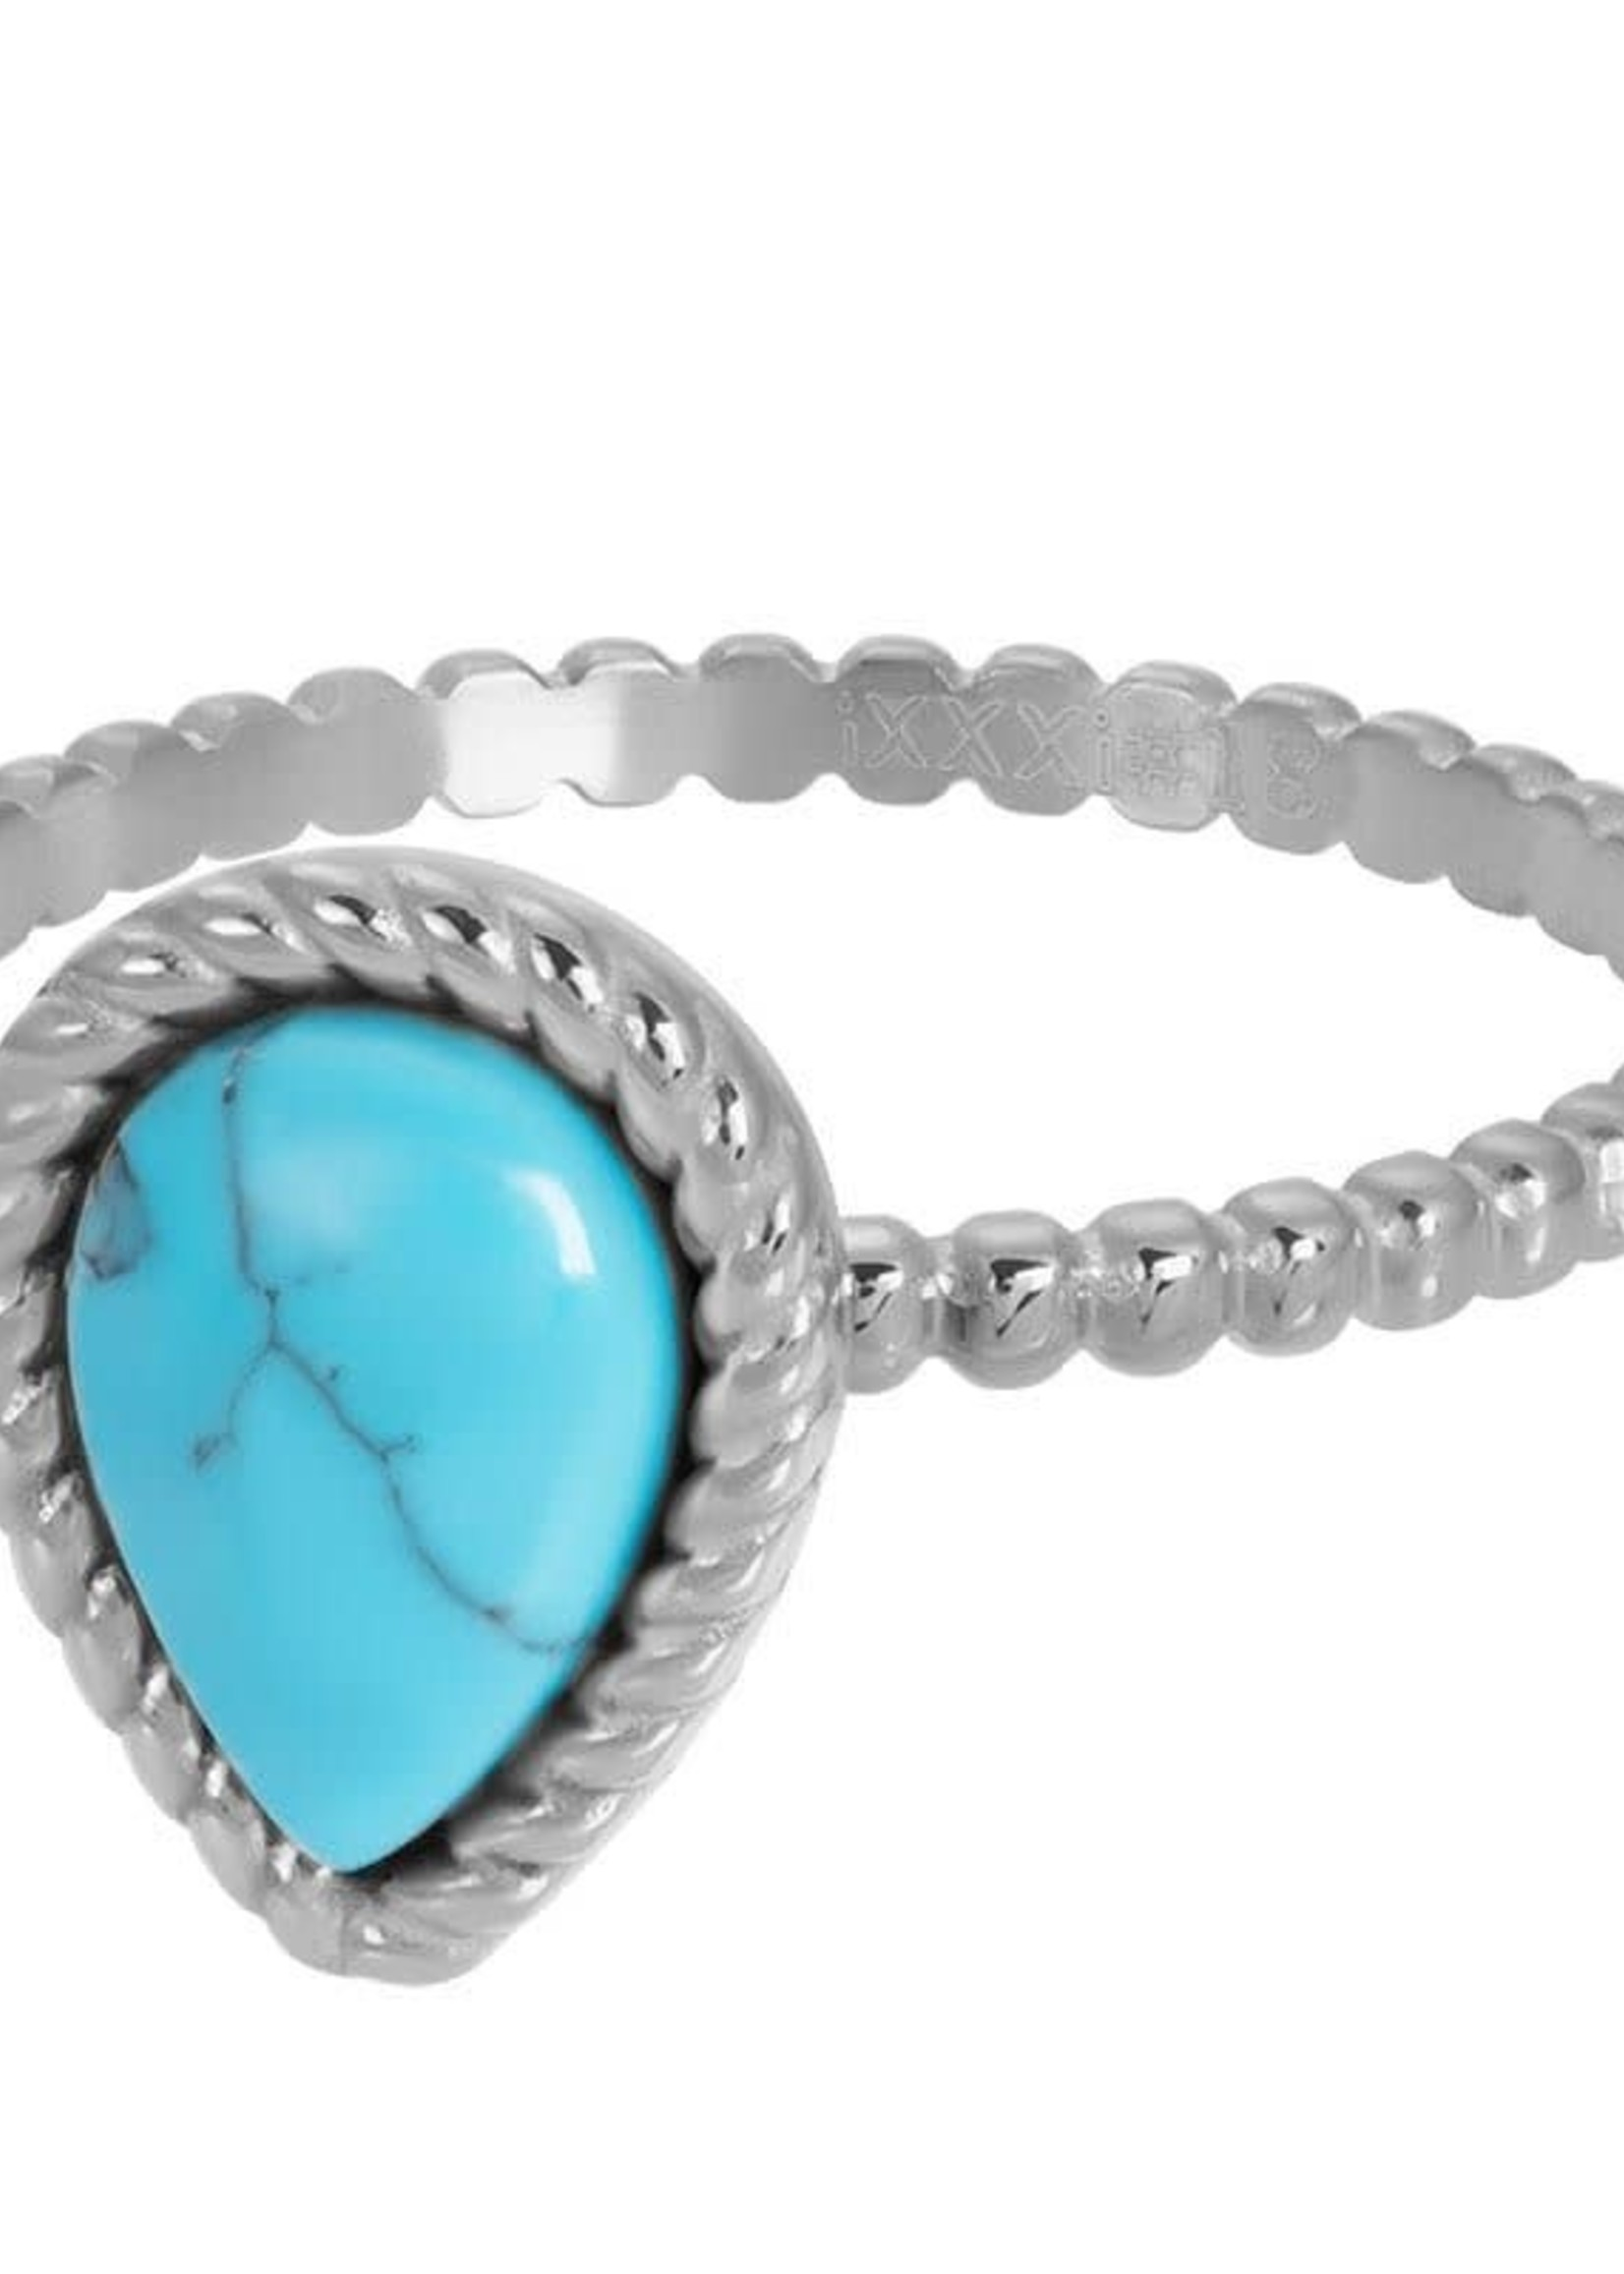 iXXXi Jewelry iXXXi vulring Magic turquoise - staal